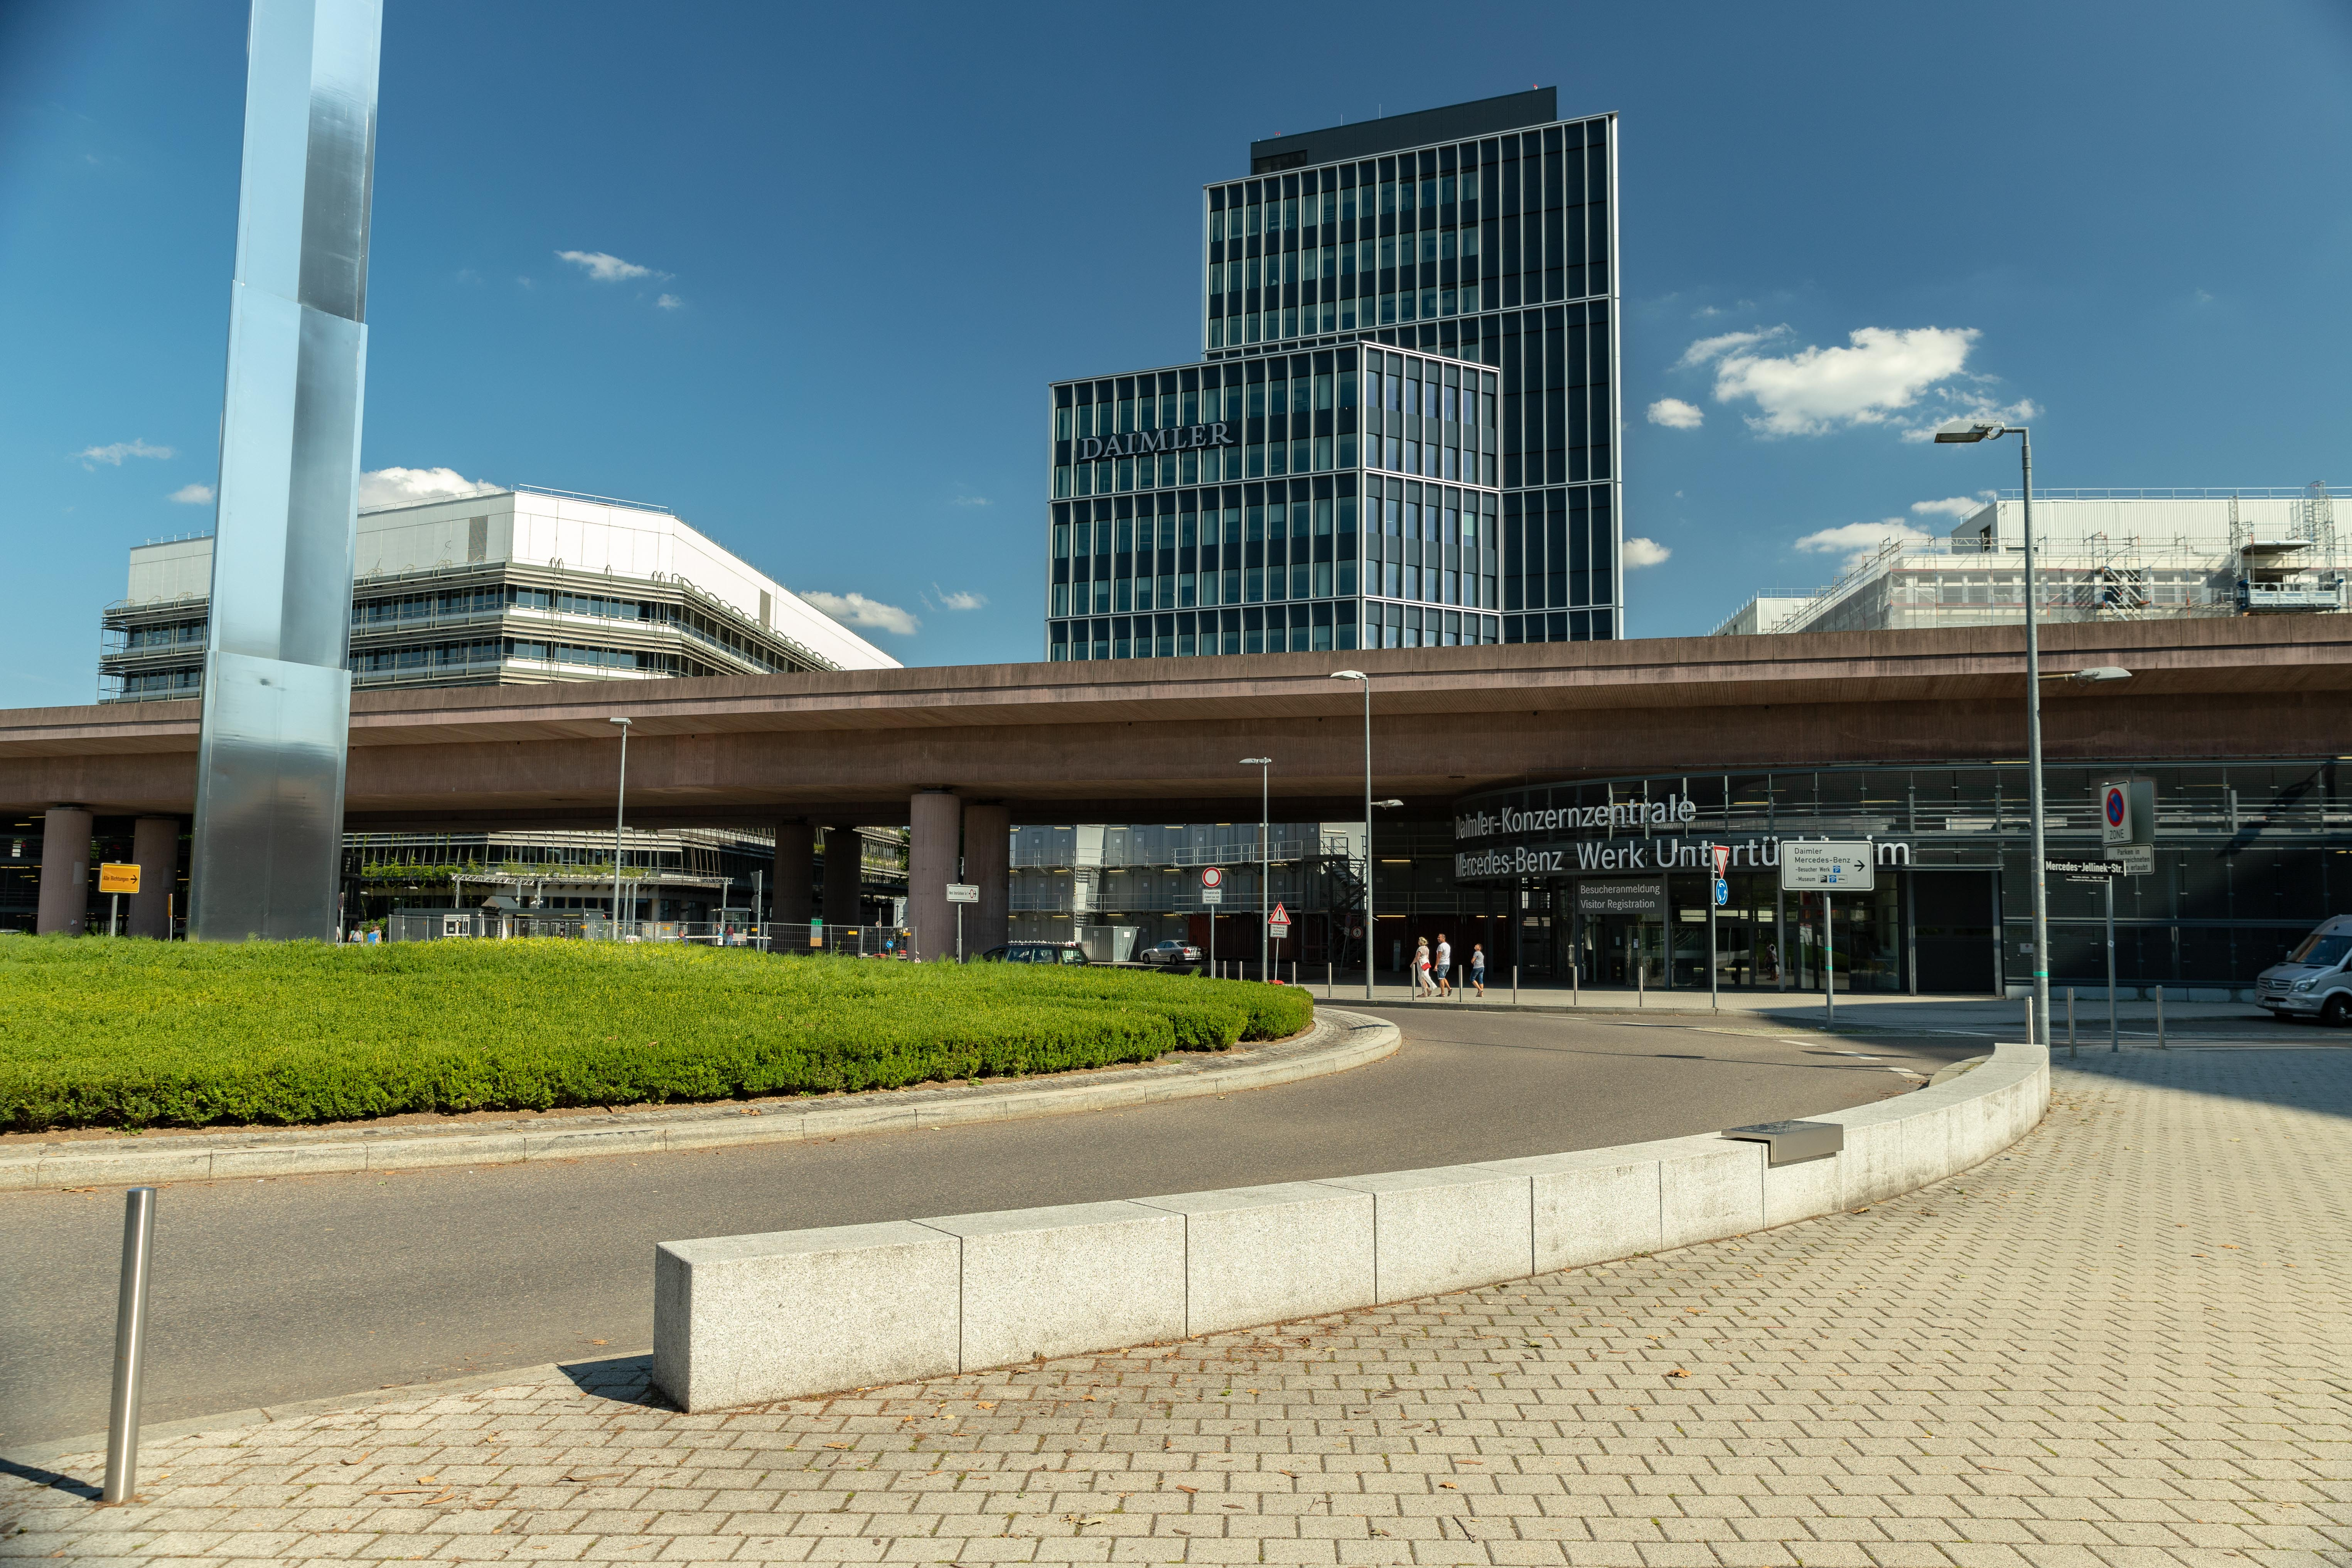 Daimler Konzernzentrale Stuttgart